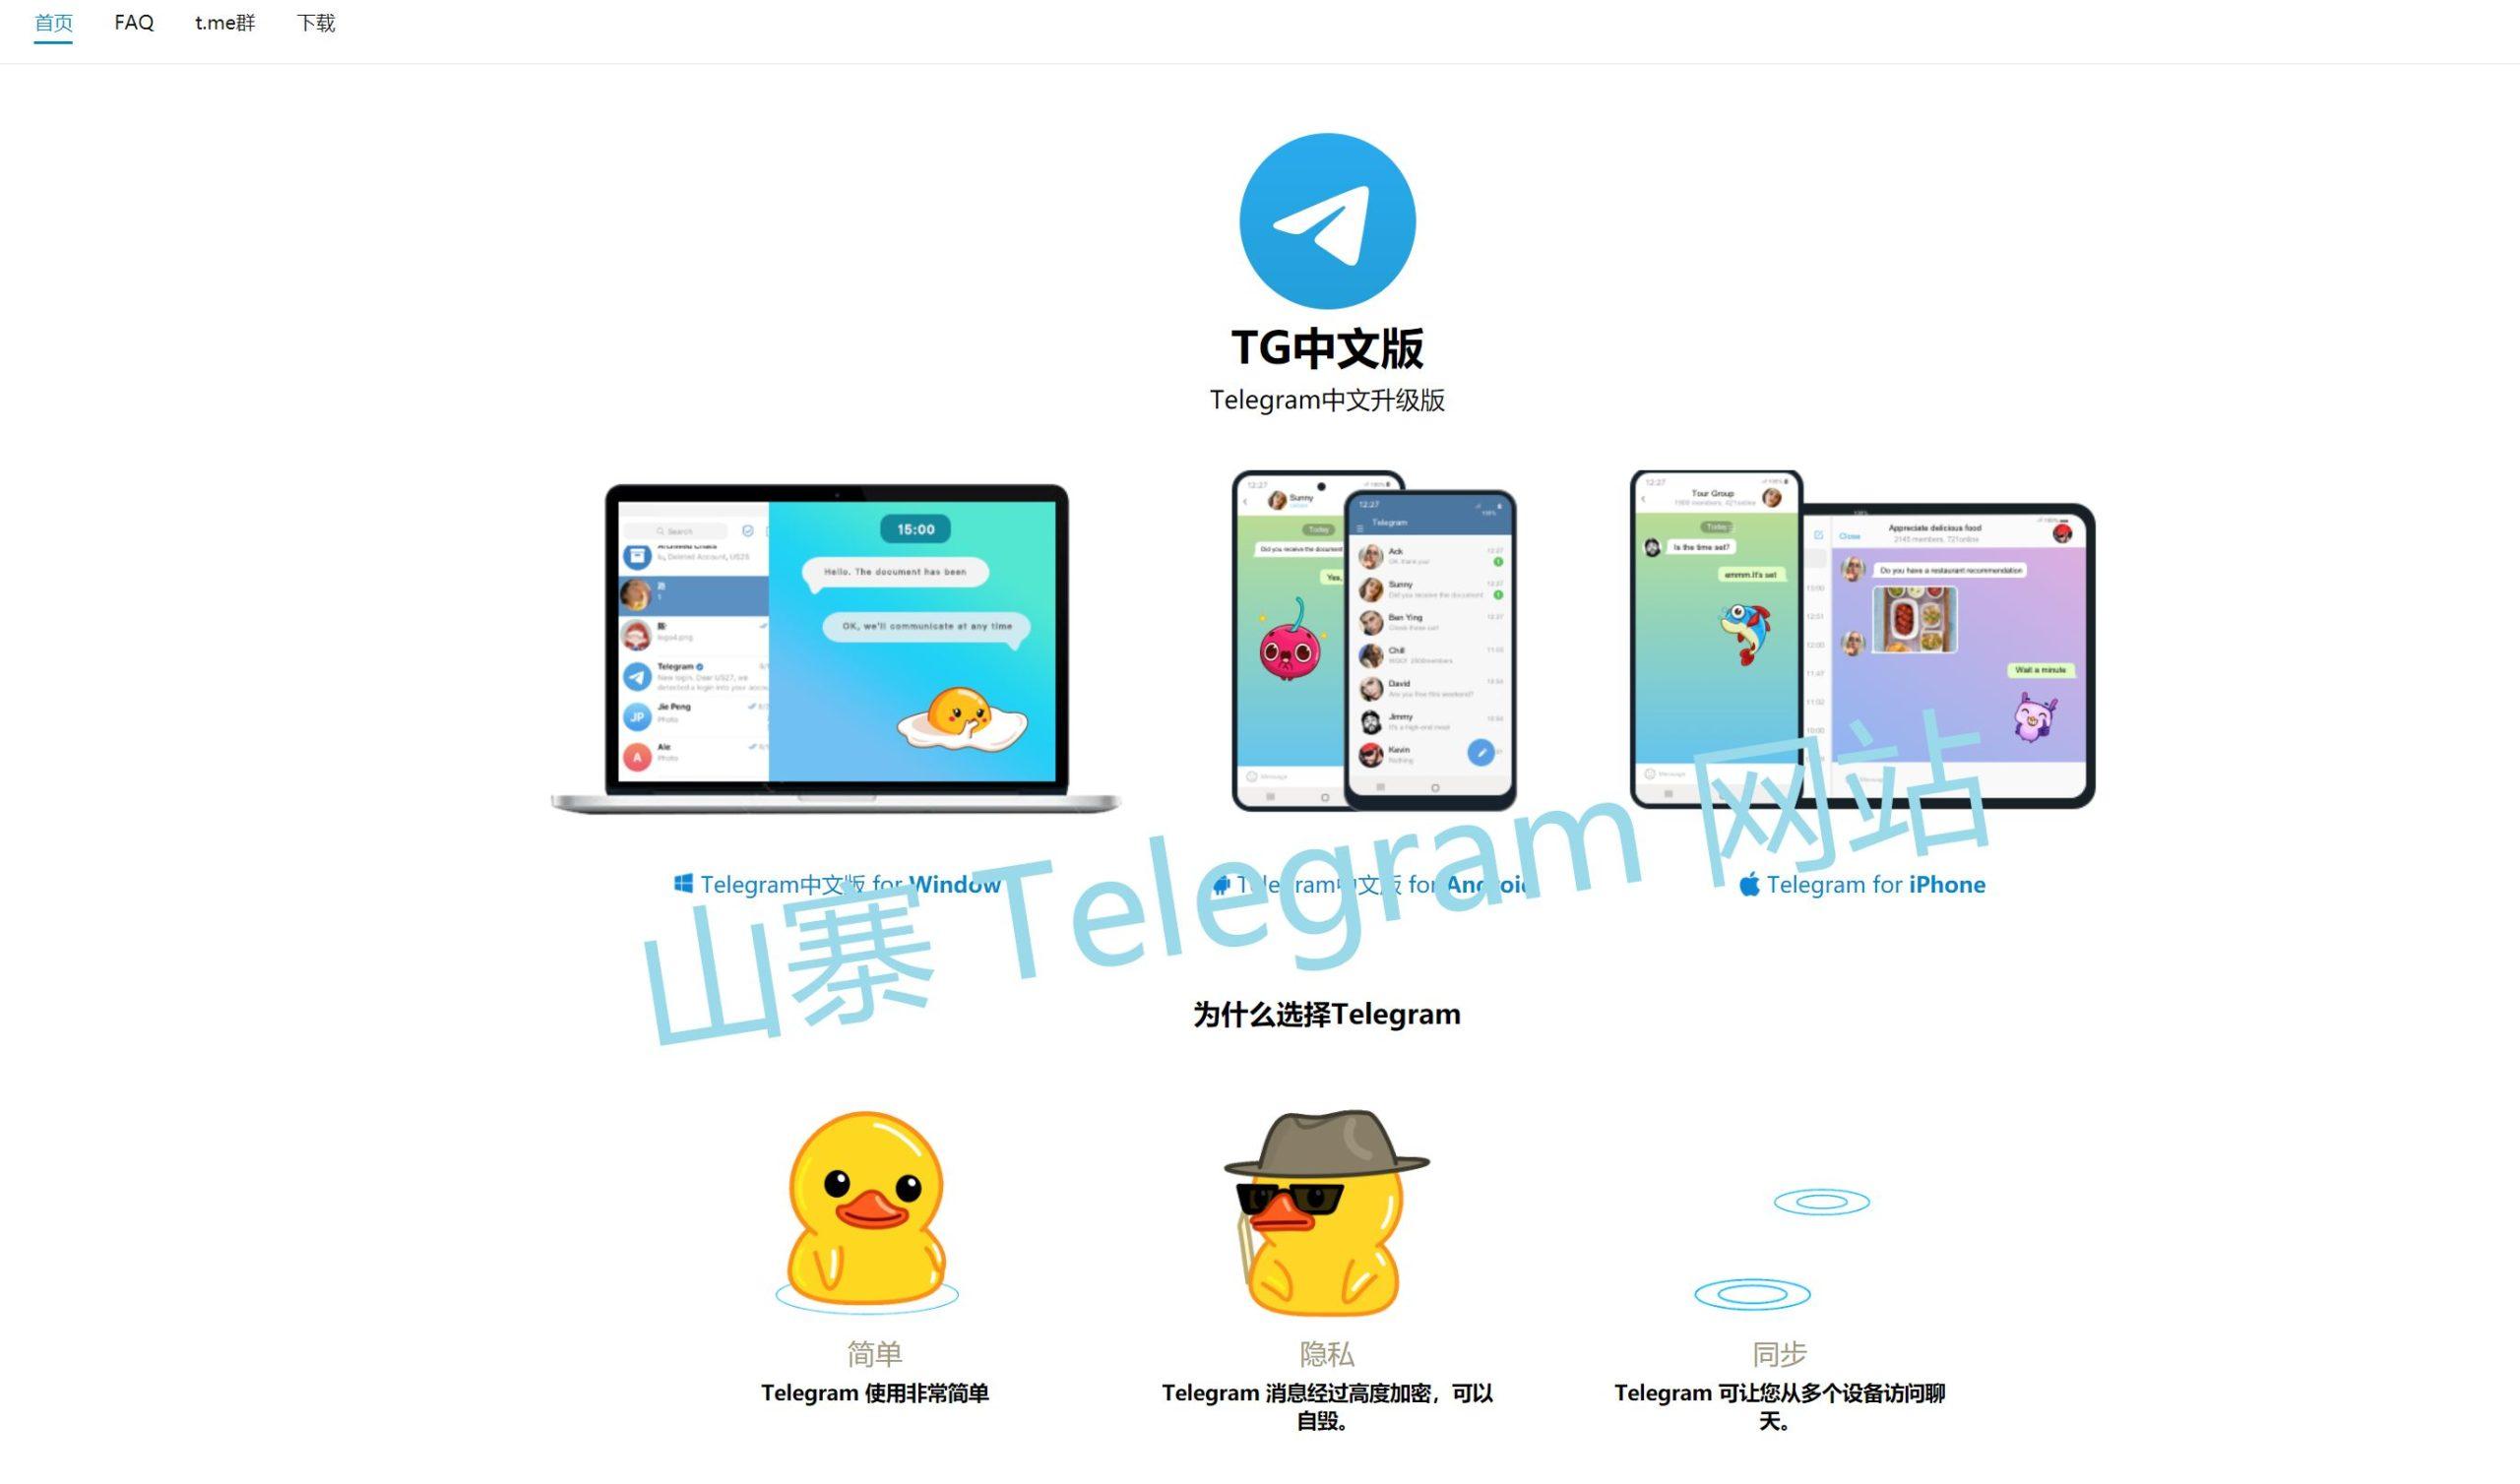 Telegram 山寨中文网